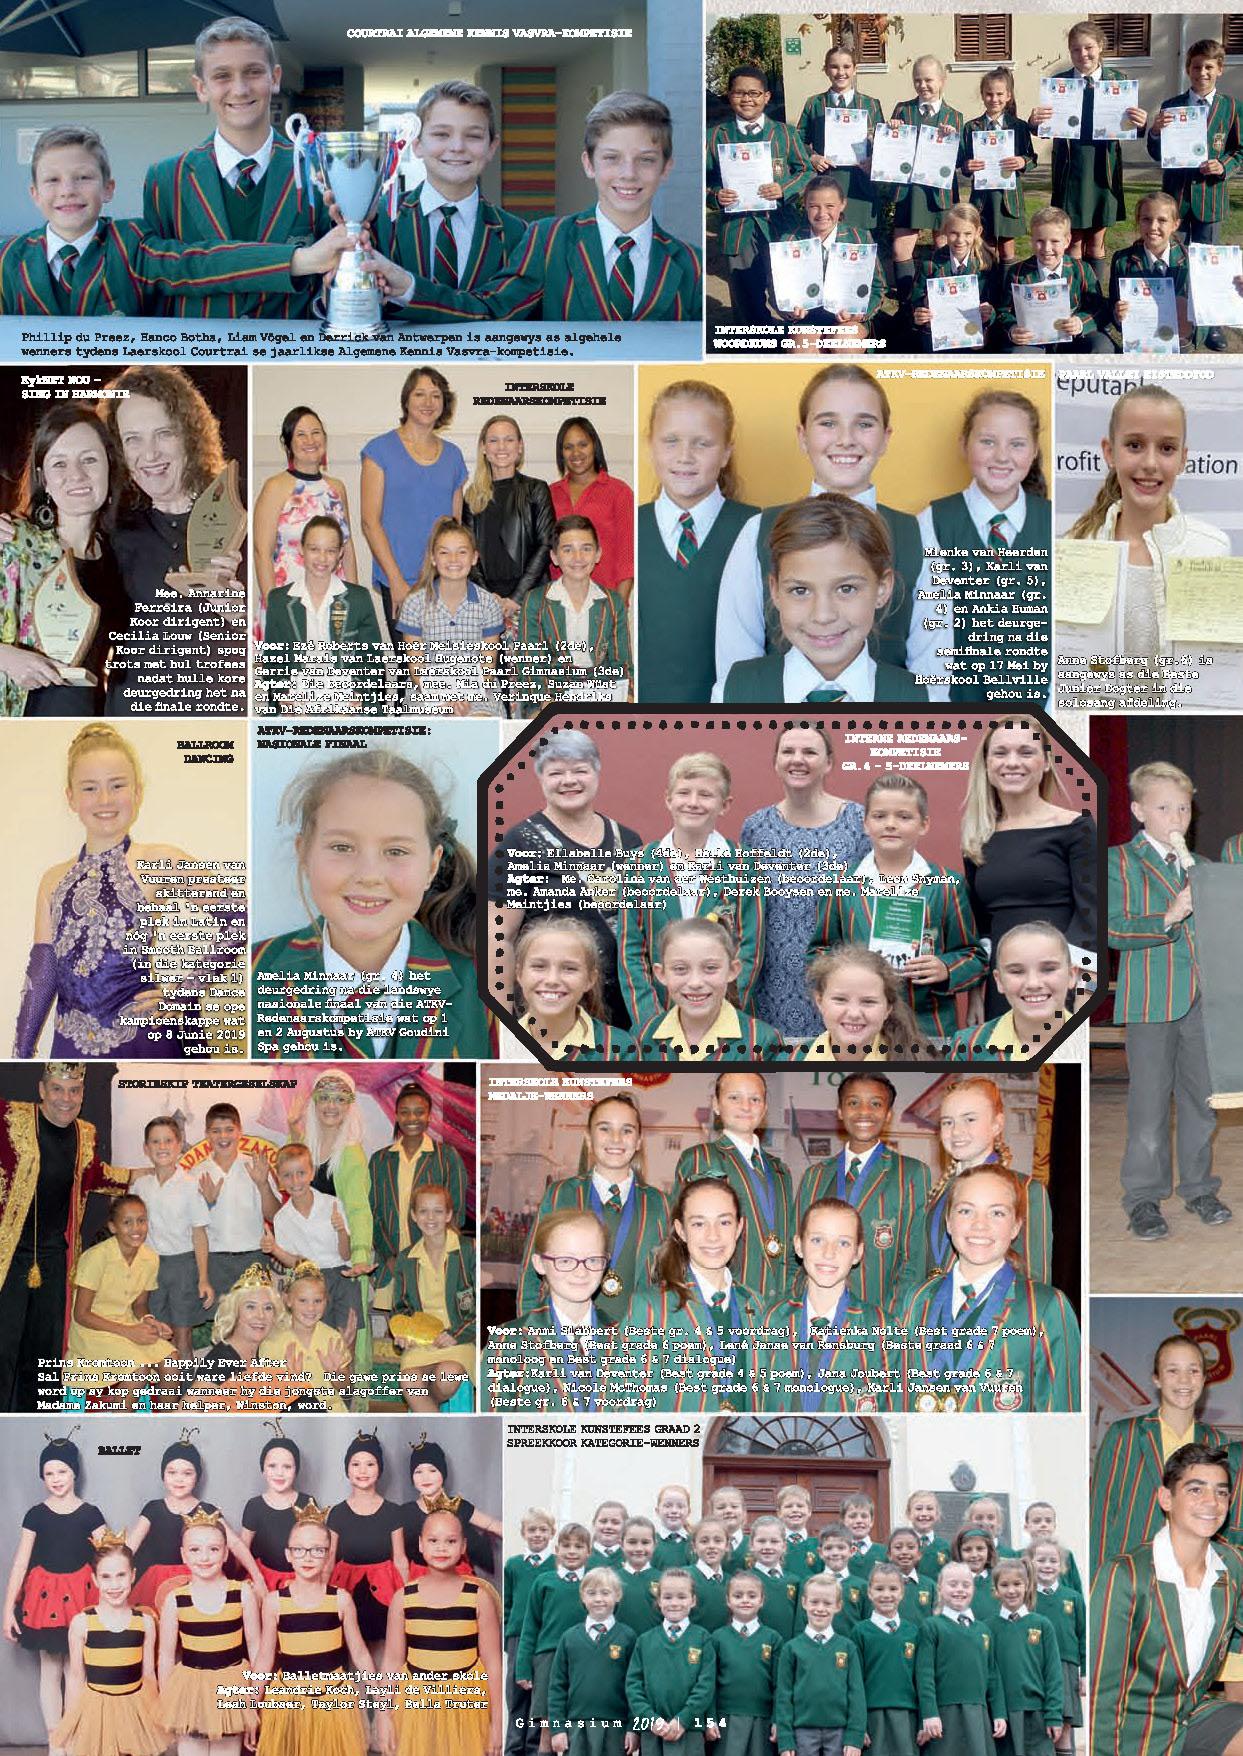 Laerskool Paarl Gimnasium_Page_12